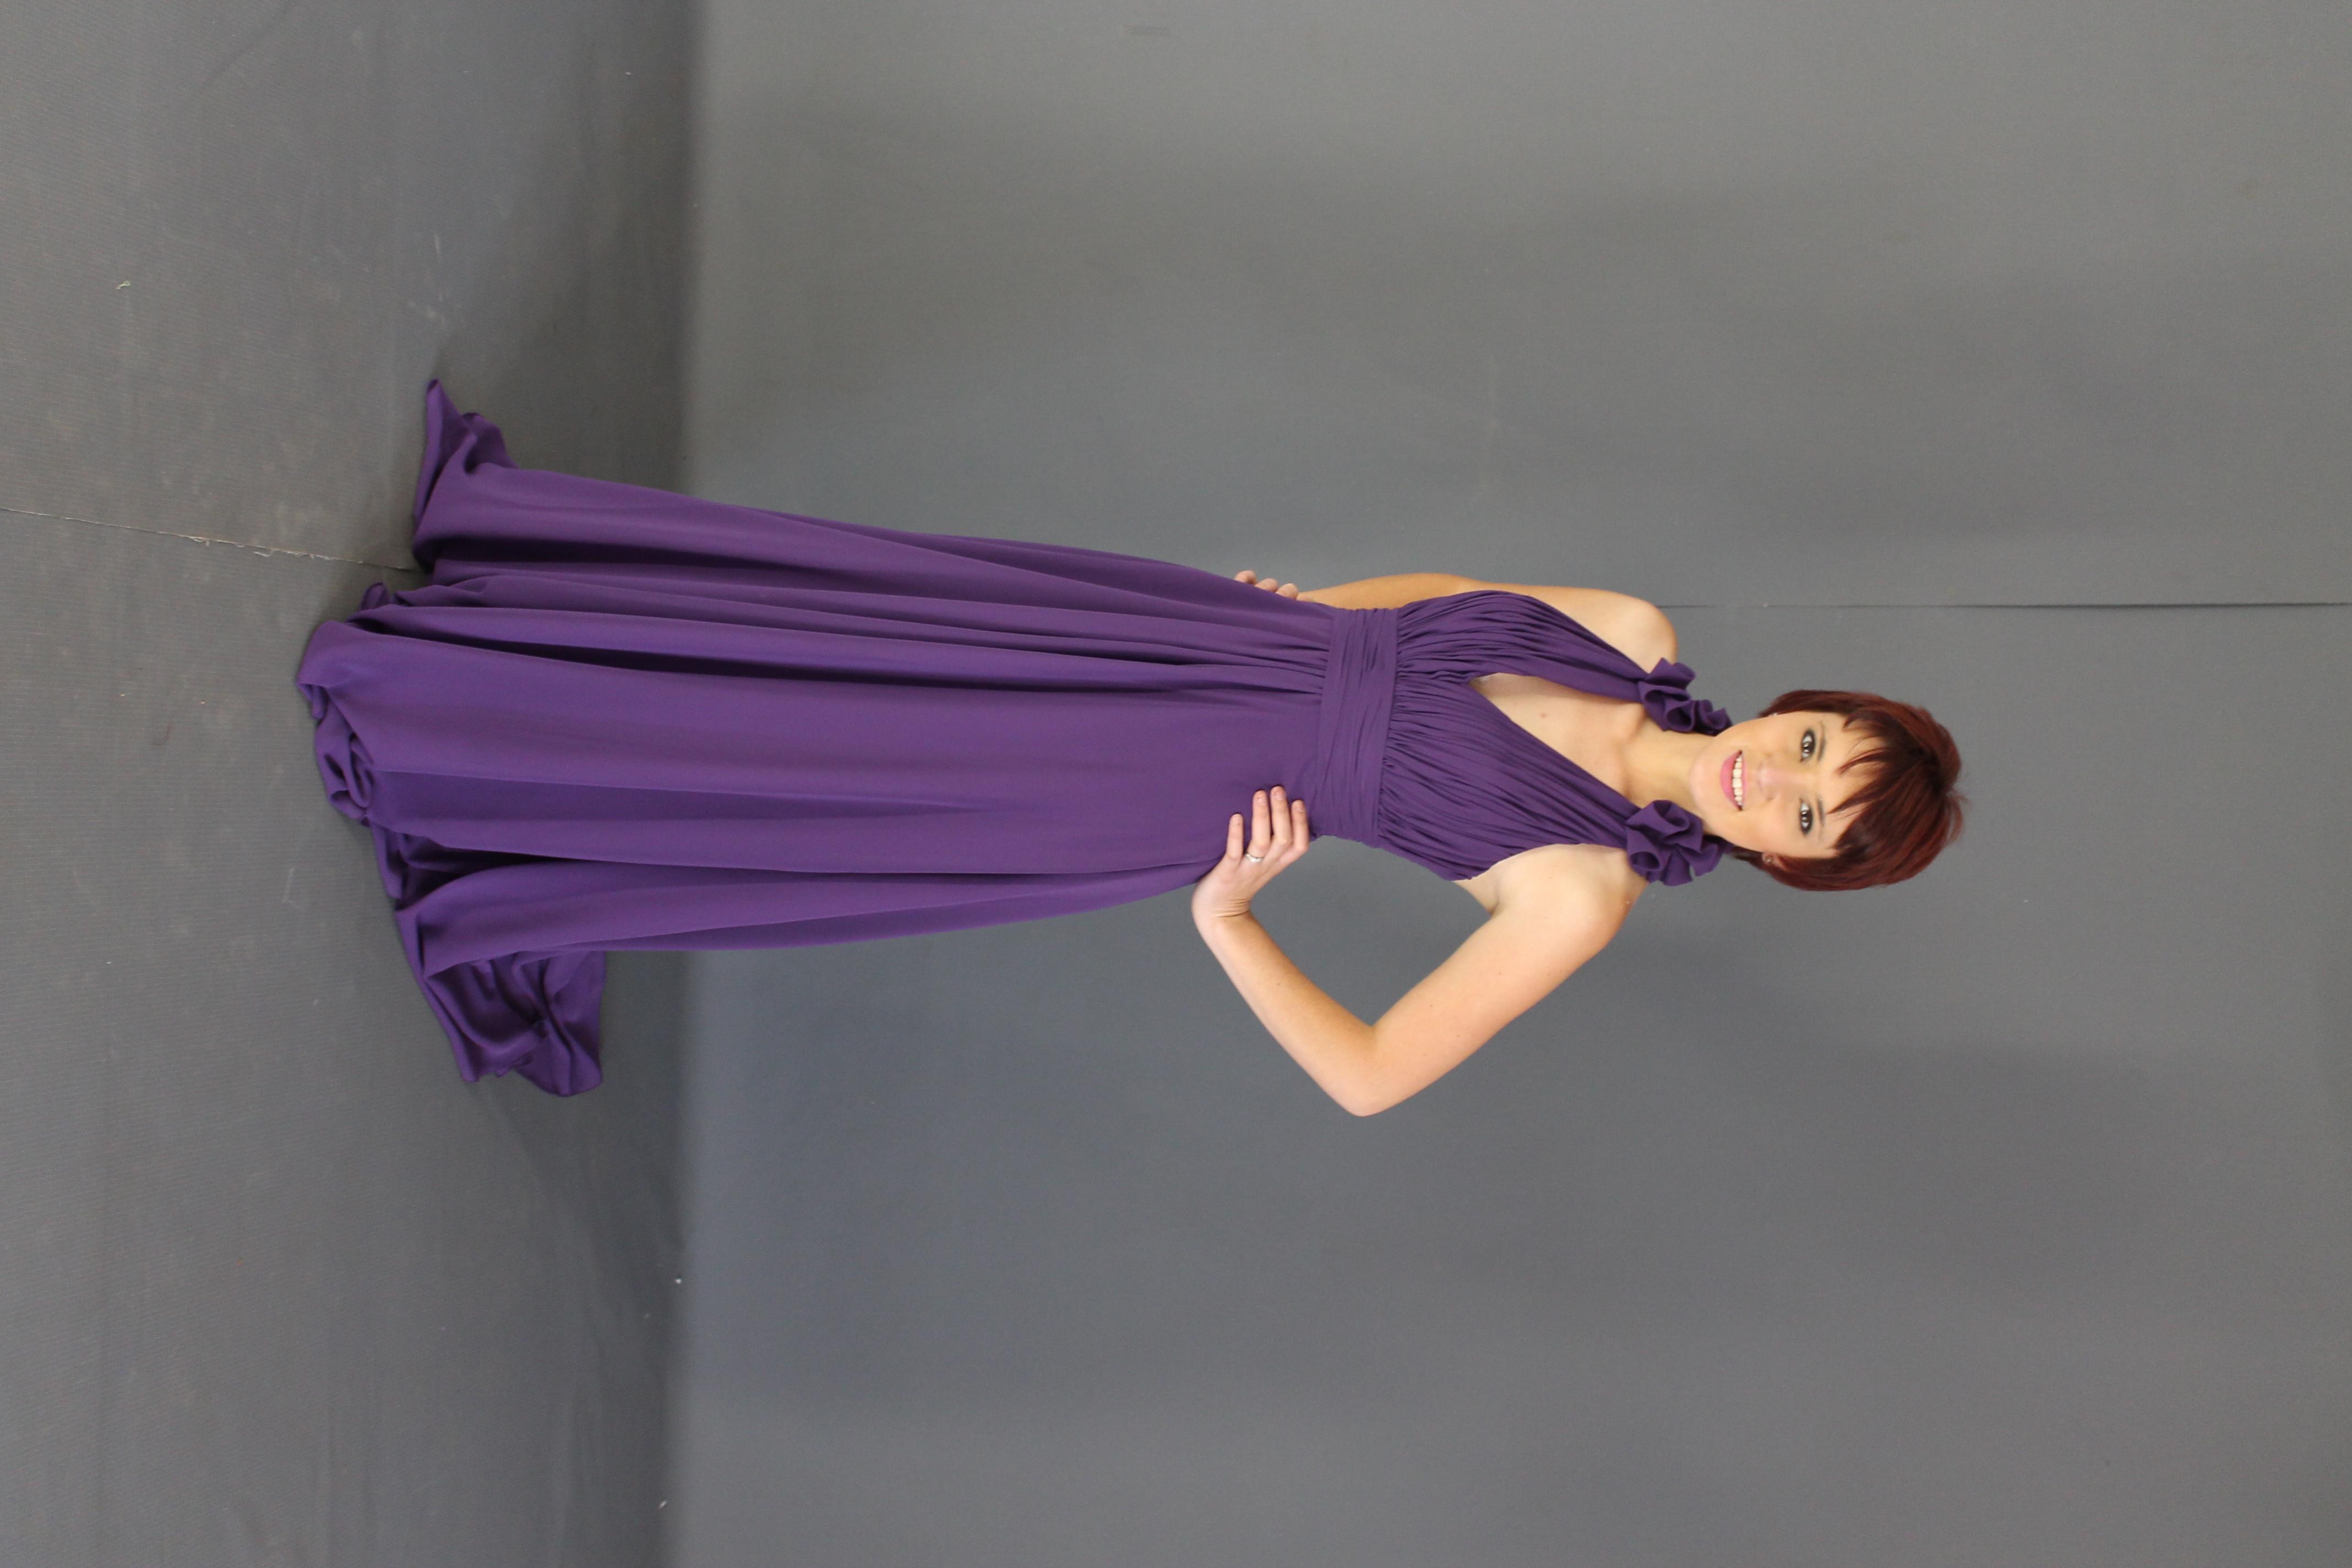 sf19402-soft-flowy-dresses-